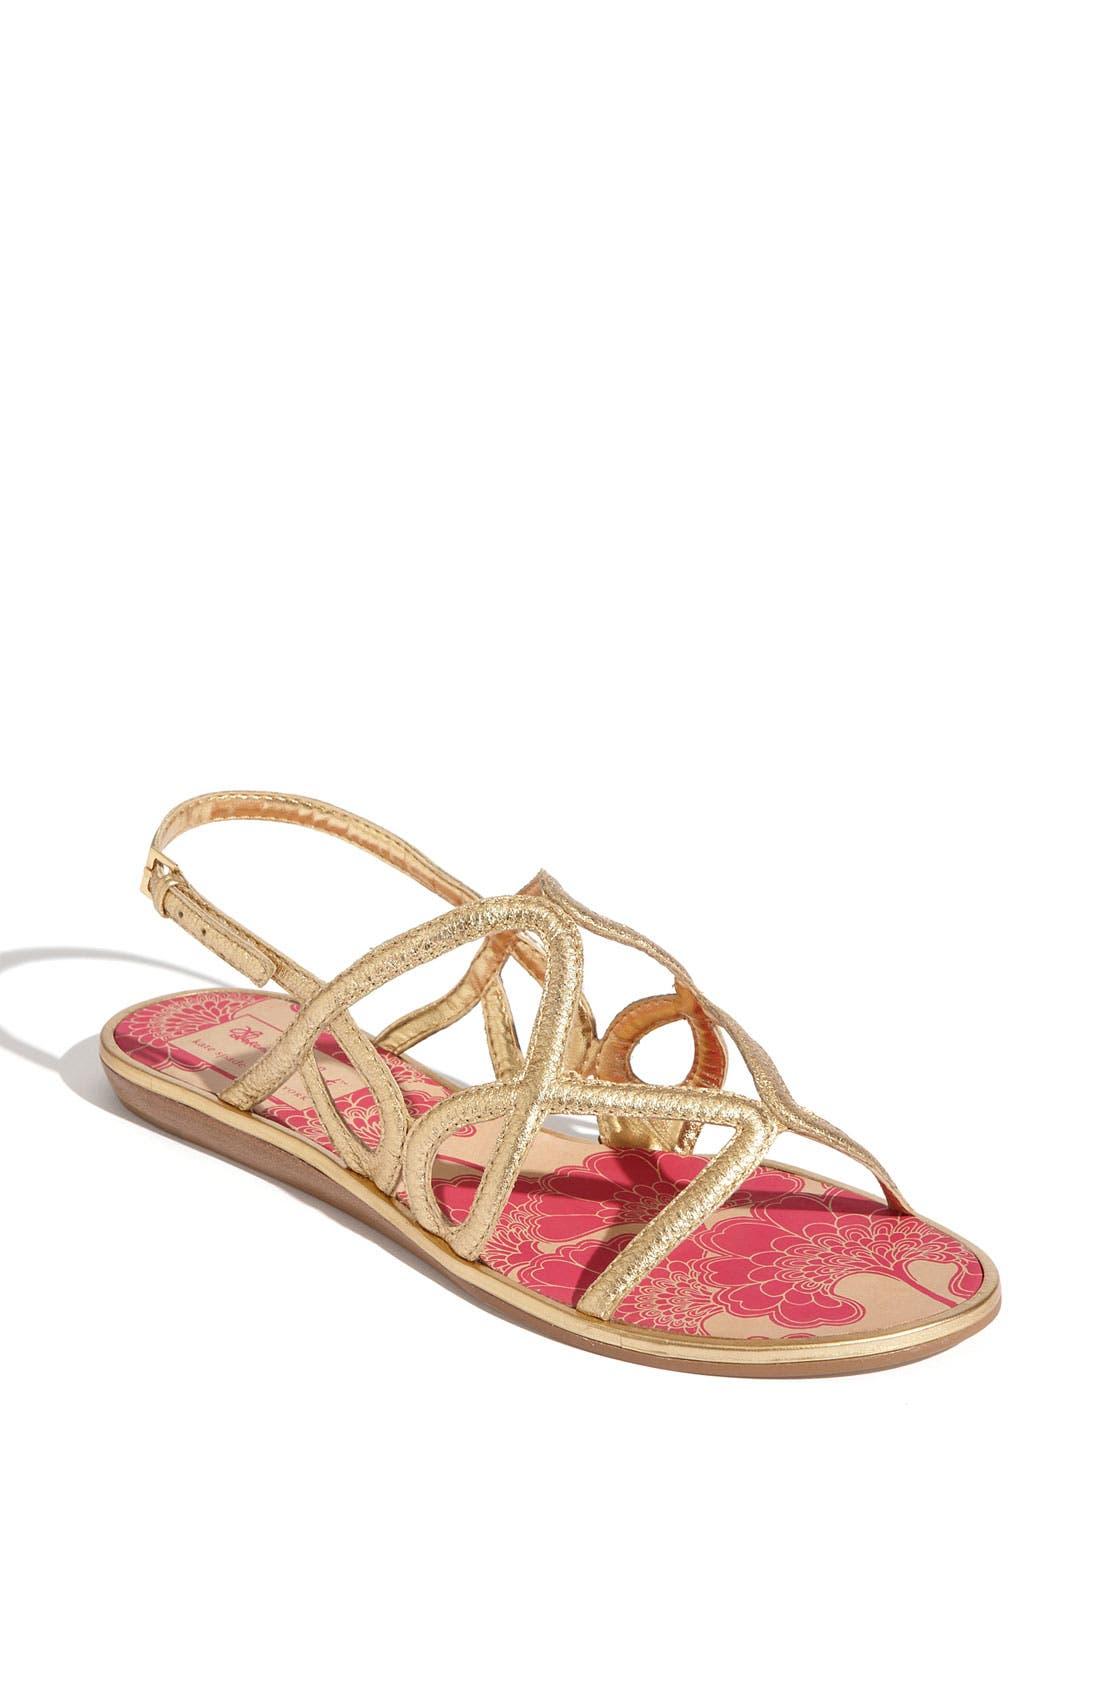 Main Image - kate spade new york 'iris' flat sandal